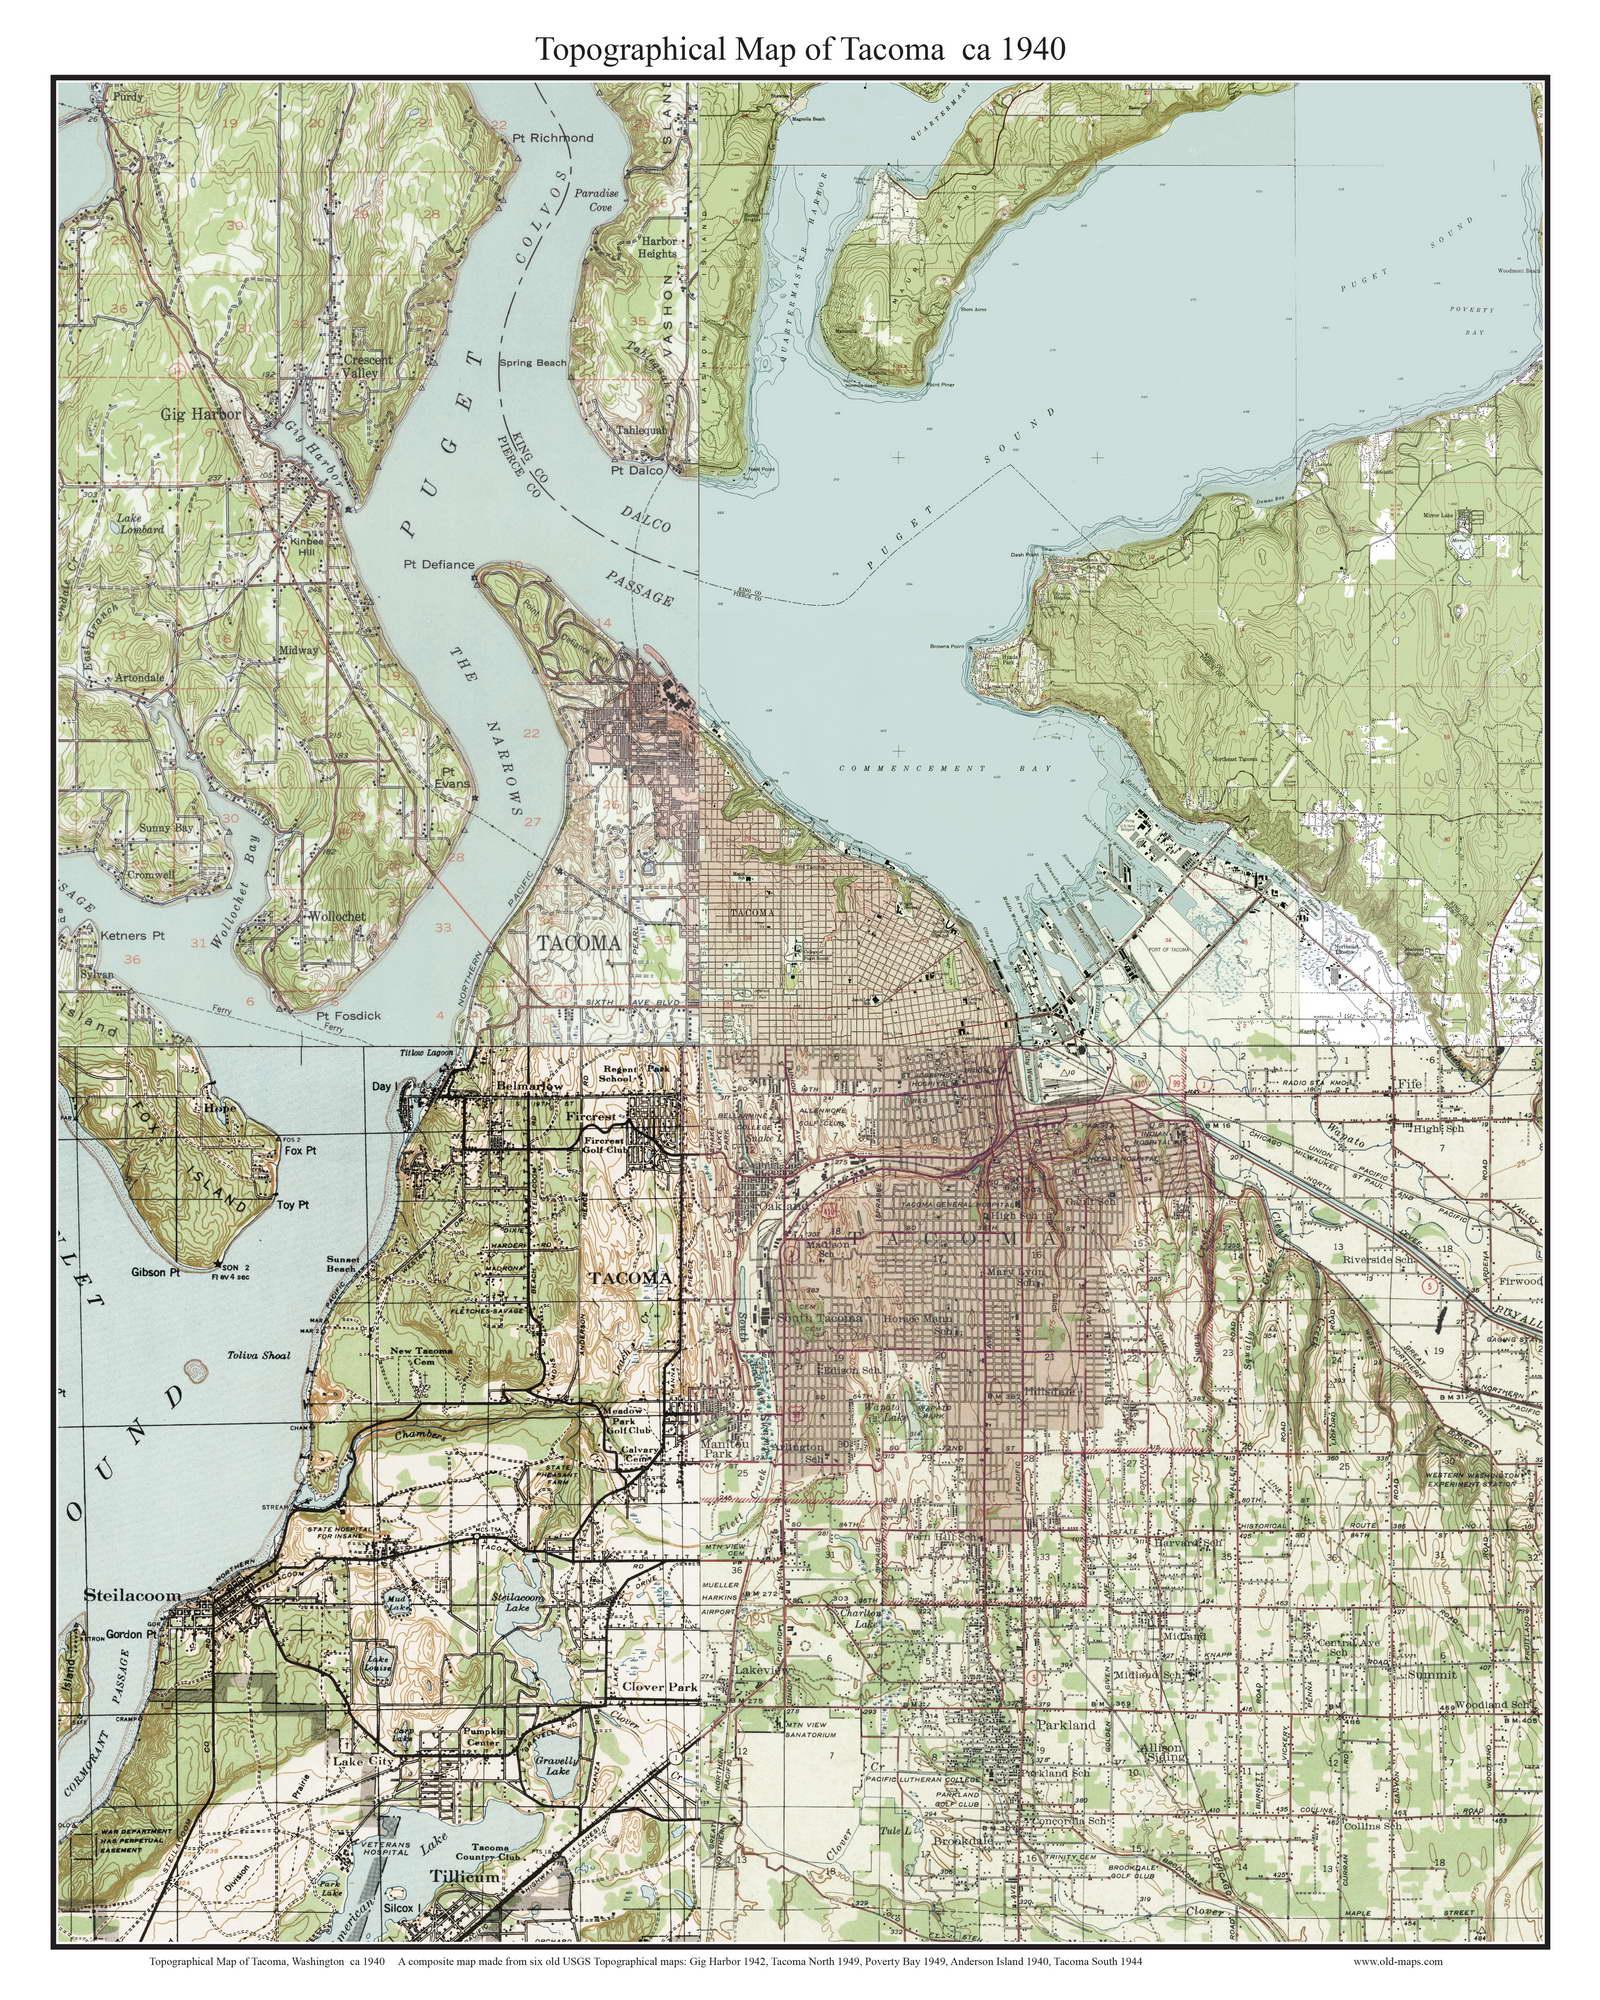 Tacoma 1940 - Custom USGS Old Topo Map - Washington State on map tacoma wash, map of tacoma washington 98404, map of neighborhoods tacoma wa, map of tacoma and surrounding cities, map of washington virginia area, zip code map houston and surrounding area, tacoma dome parking area, map of washington hood canal area, map of north tacoma washington, map of greater seattle tacoma area, map of north end tacoma, map of washington dc area, map of washington seattle area, map of washington state military bases, map of downtown tacoma wa, map tacoma fife, map seattle washington usa, map of washington oregon area, map of washington baltimore area, map of seattle and surrounding cities,